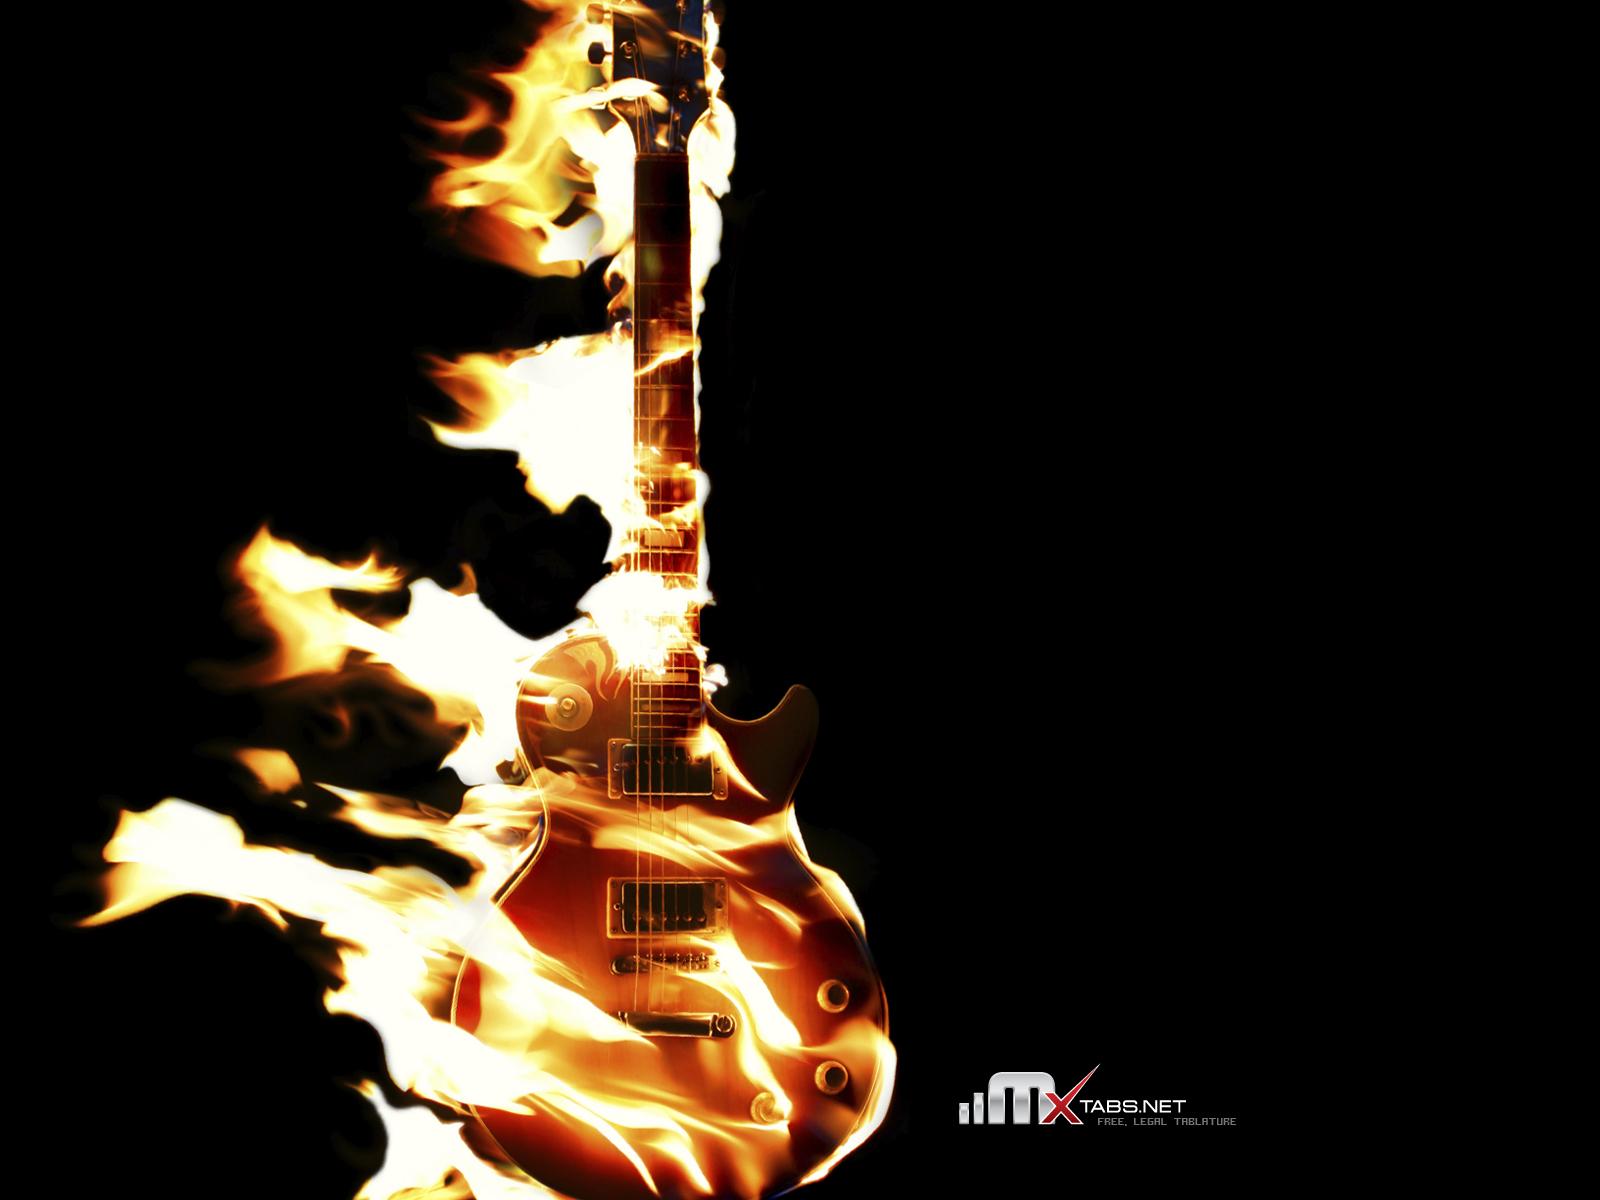 Wallpapers   Musica Guitarra RockNRoll Wallpapers 1600x1200